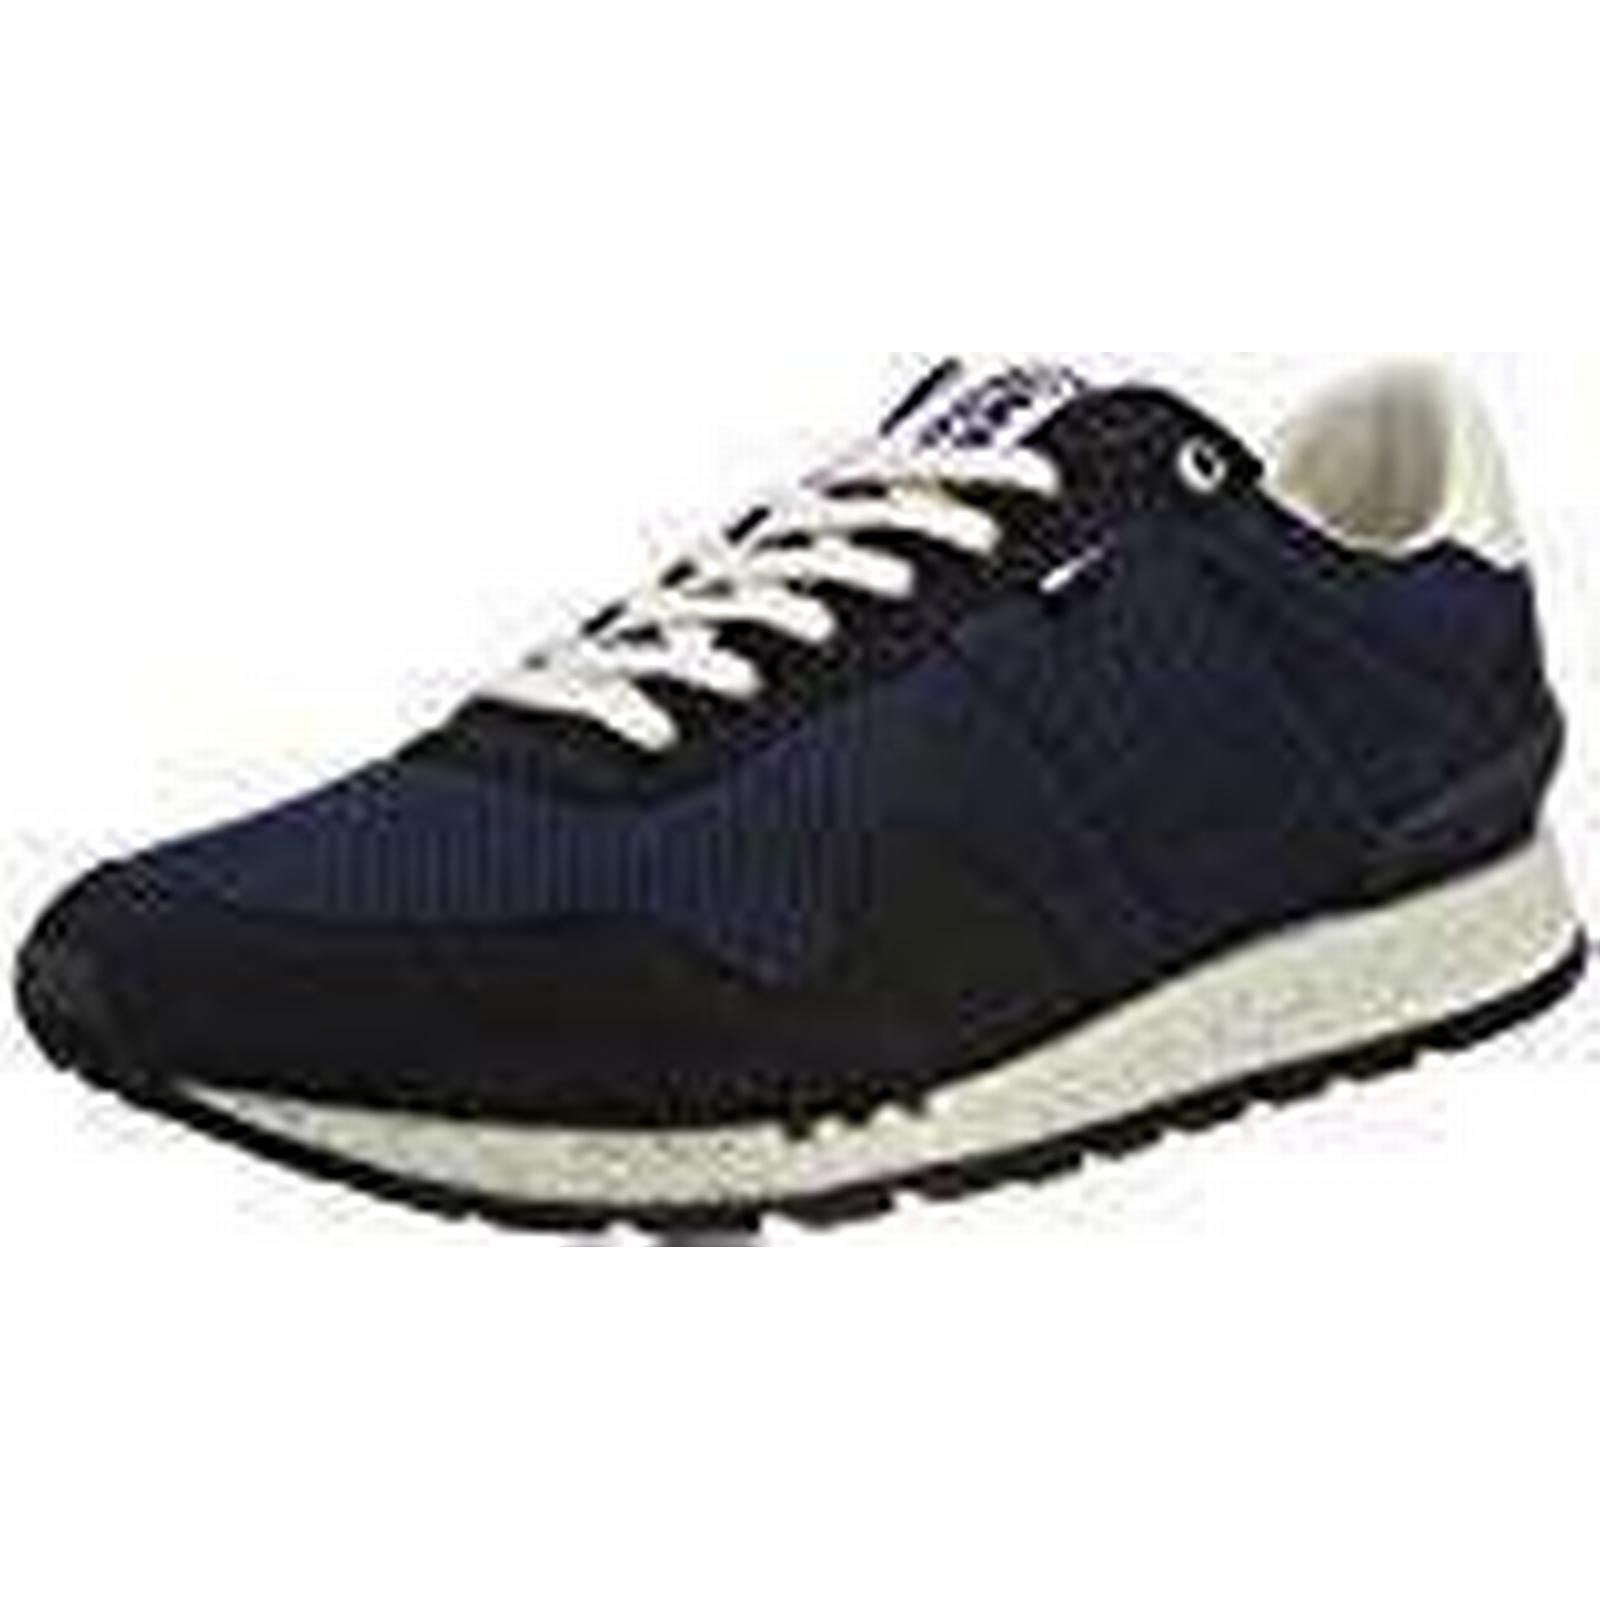 Tommy Jeans Hilfiger Denim Men's Lifestyle Low-Top Sneakers, UK Blue (Ink 006), 10 UK Sneakers, 845a2b